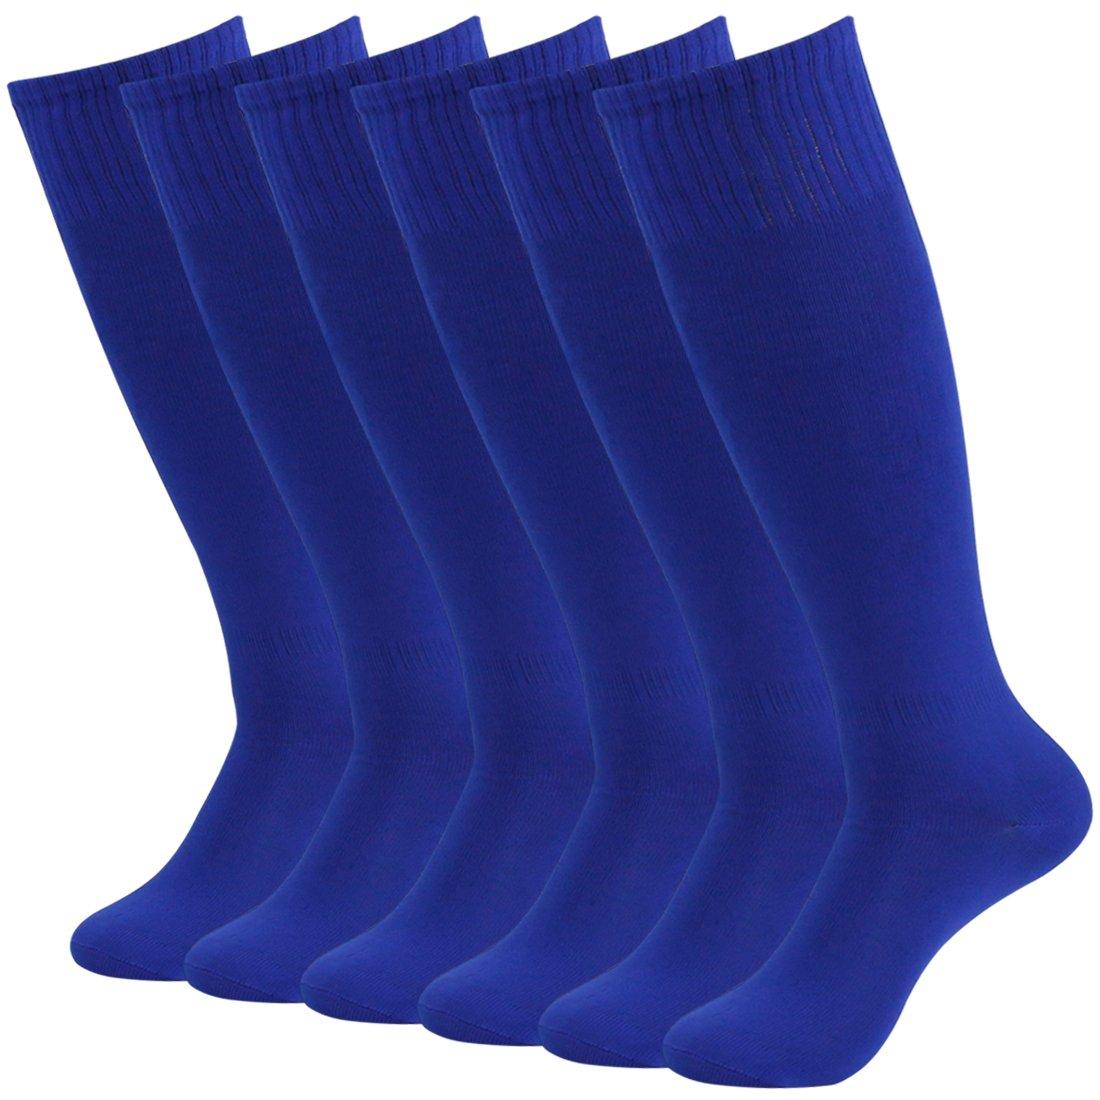 Fasoar Women Men Youth Girls 6-Pairs Referee Knee High Socks  Blue Solid Pattern Rugby Socks  6 pack blue  One Size by Fasoar